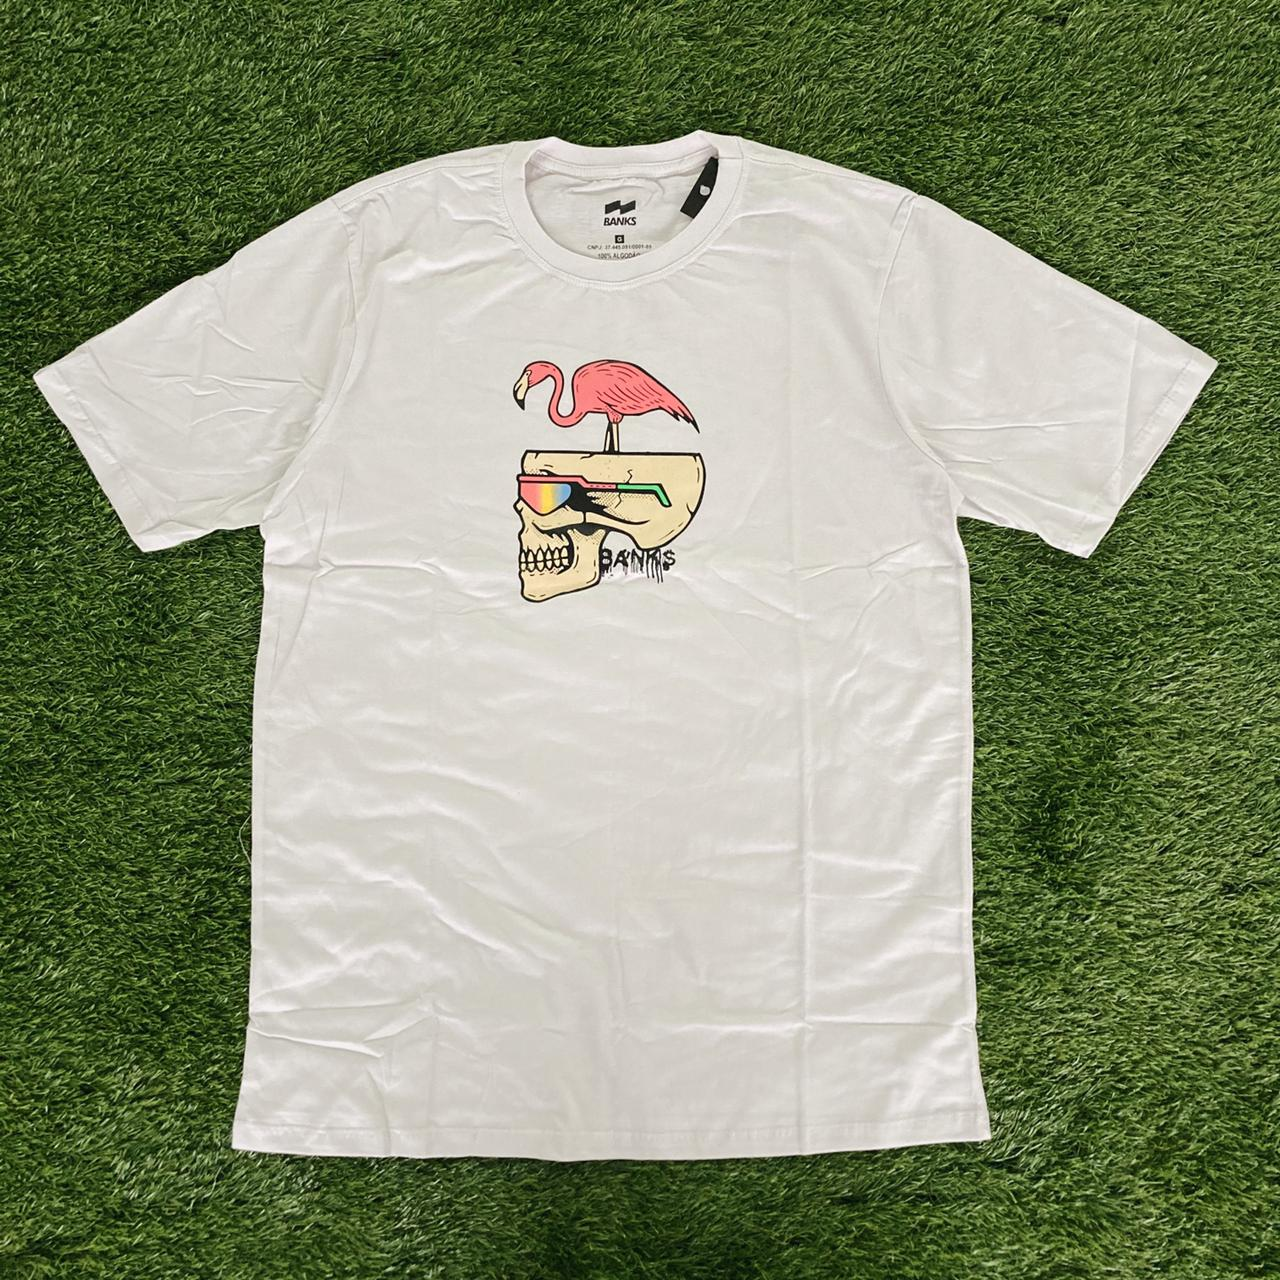 Camiseta banks cav flamingo branca